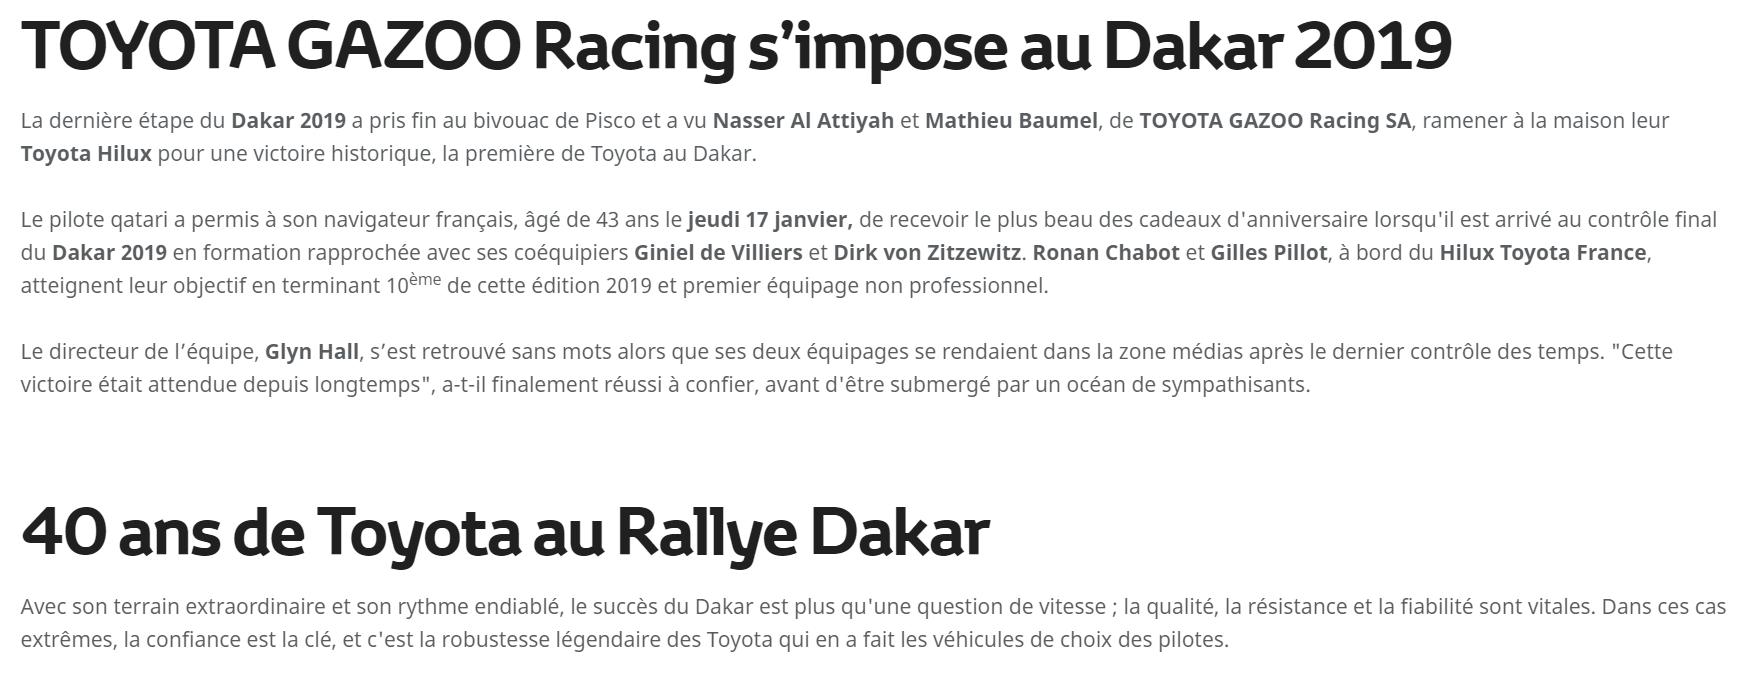 toyota gazoo racing au rallye Dakar 2019